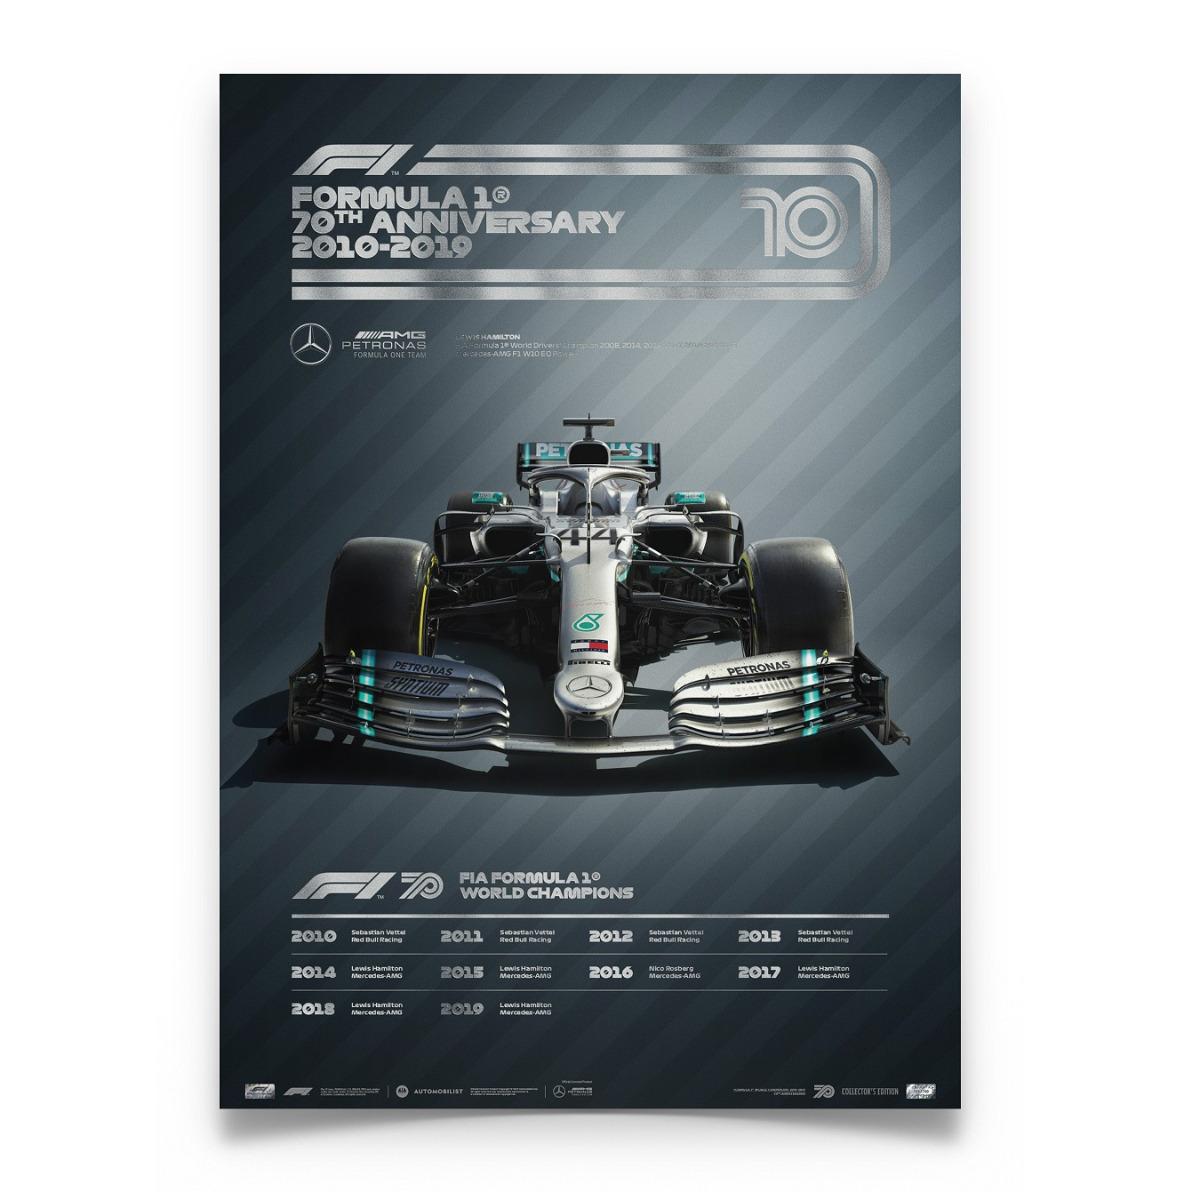 FORMULA 1® DECADES - 2010s Mercedes-AMG Petronas F1 Team